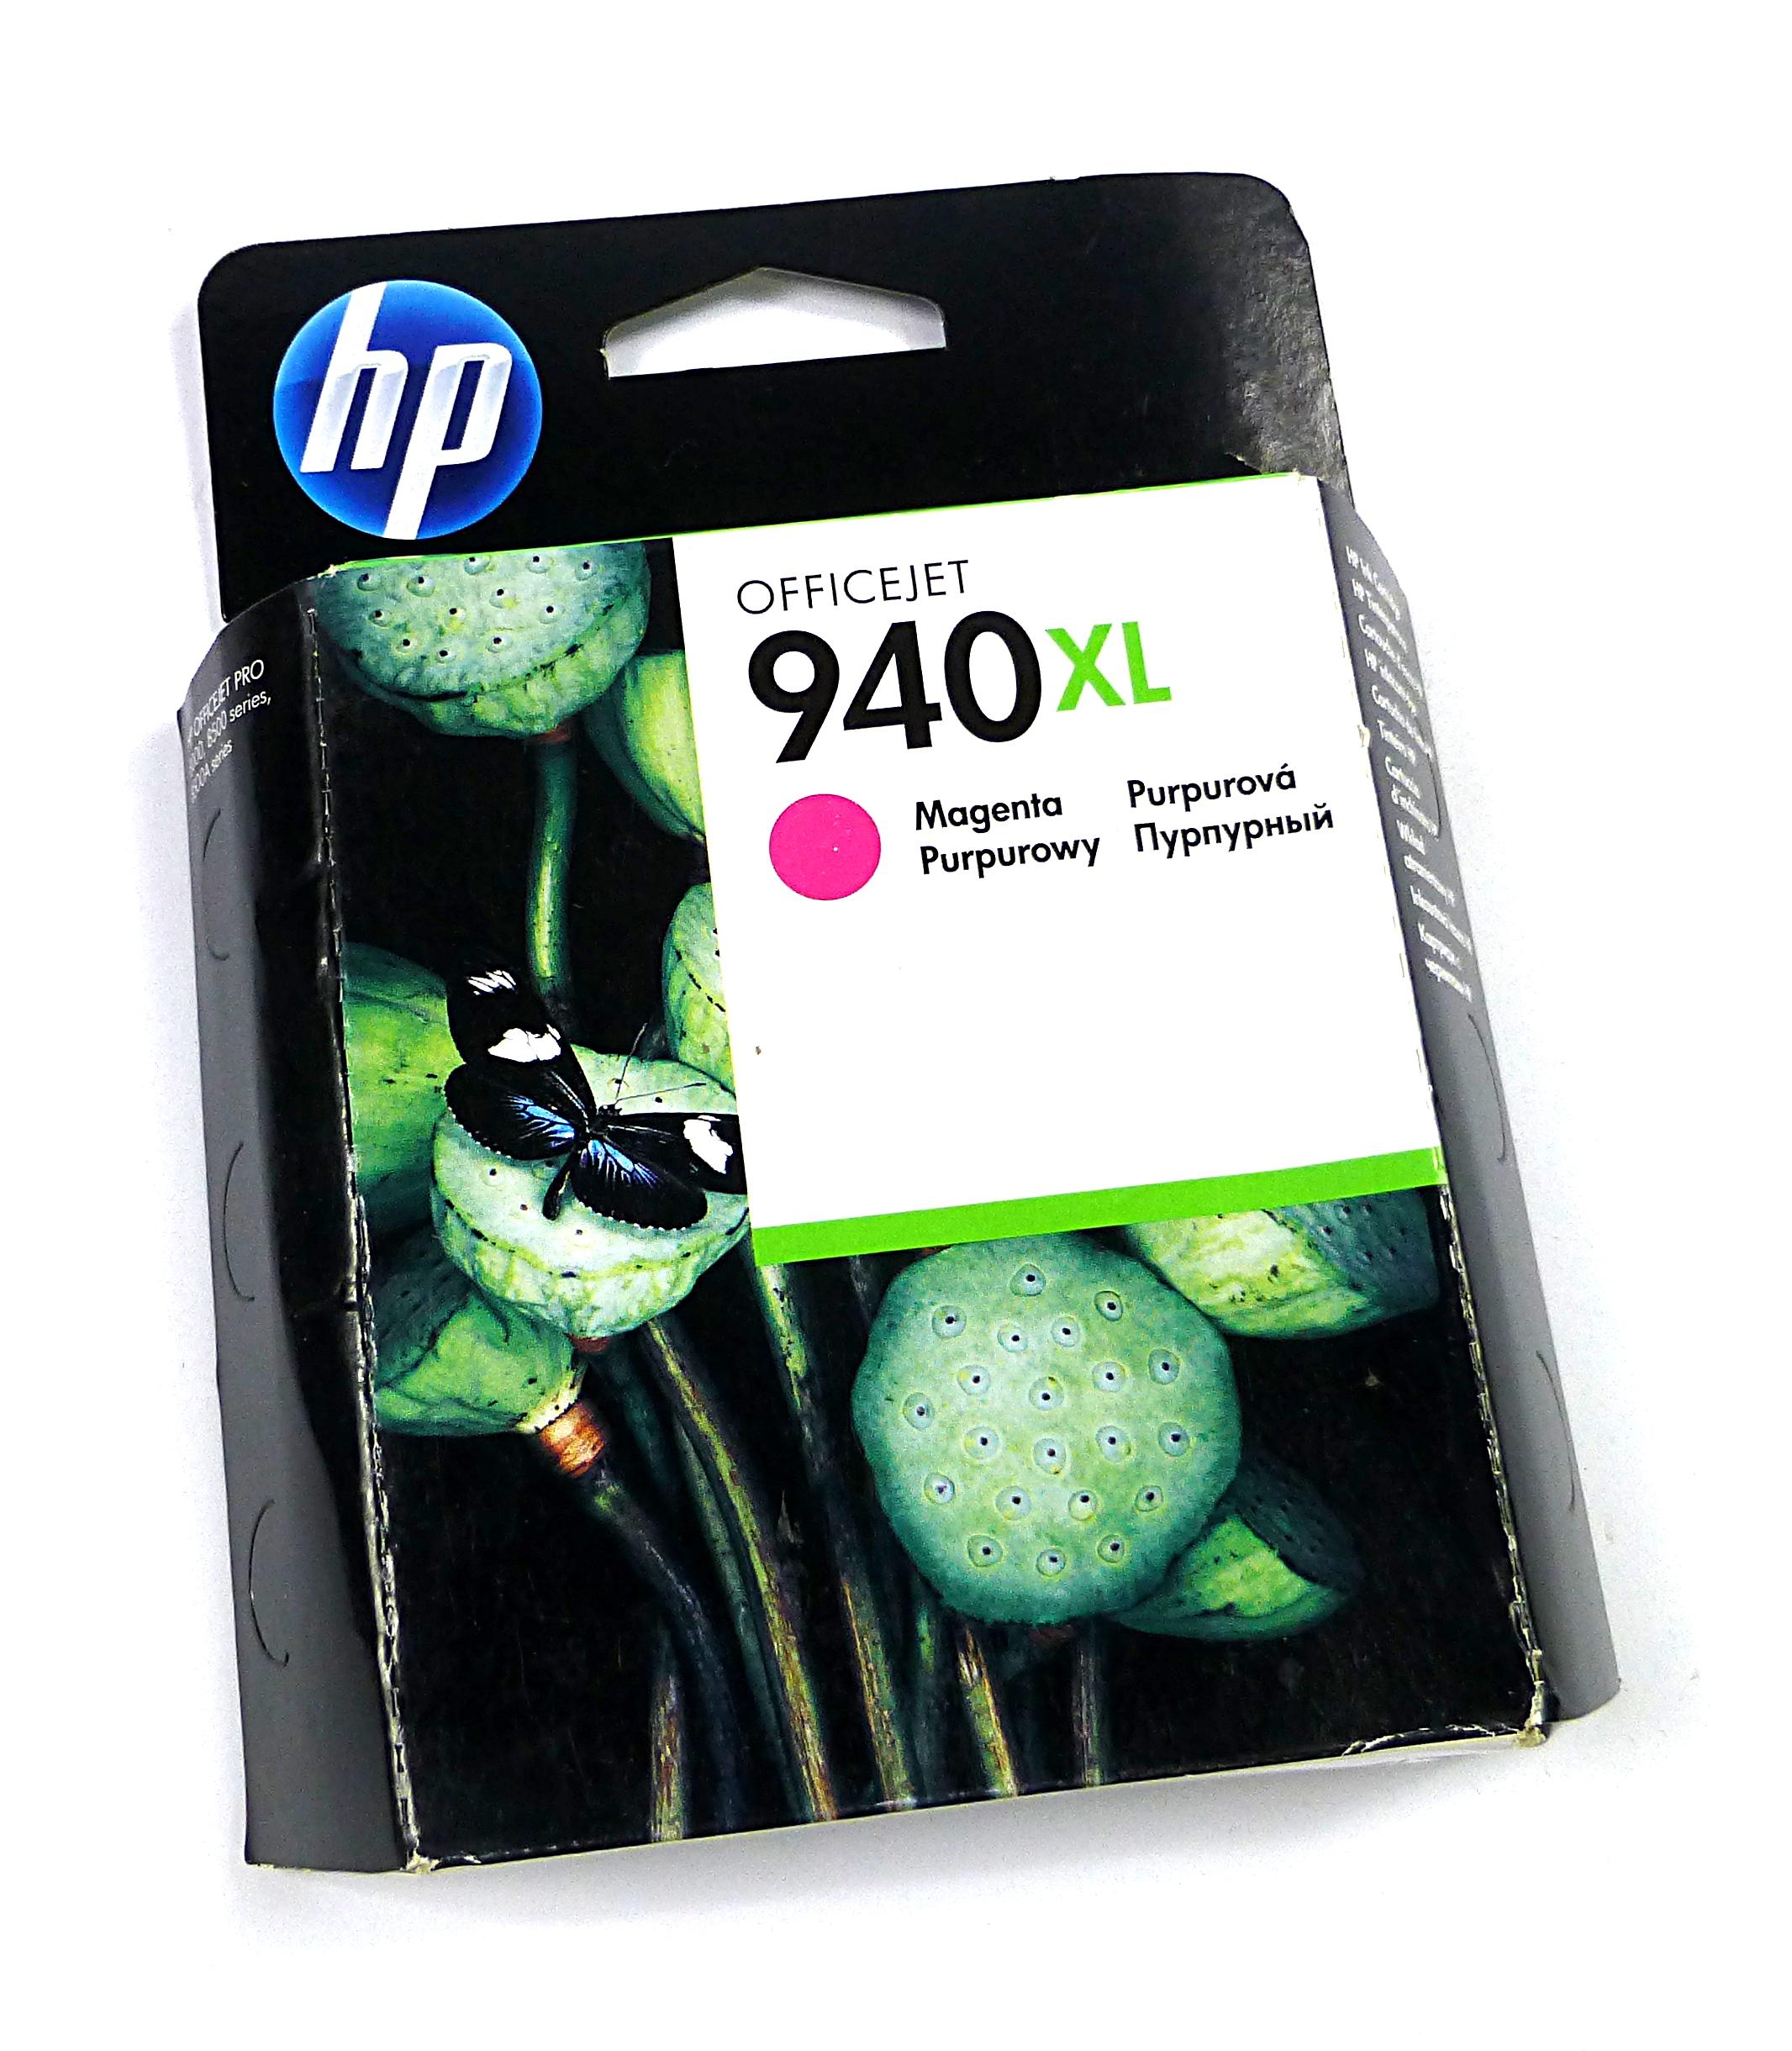 New Genuine HP C4908AE/940XL High-Capacity Magenta Ink Cartridge - Expired Stock